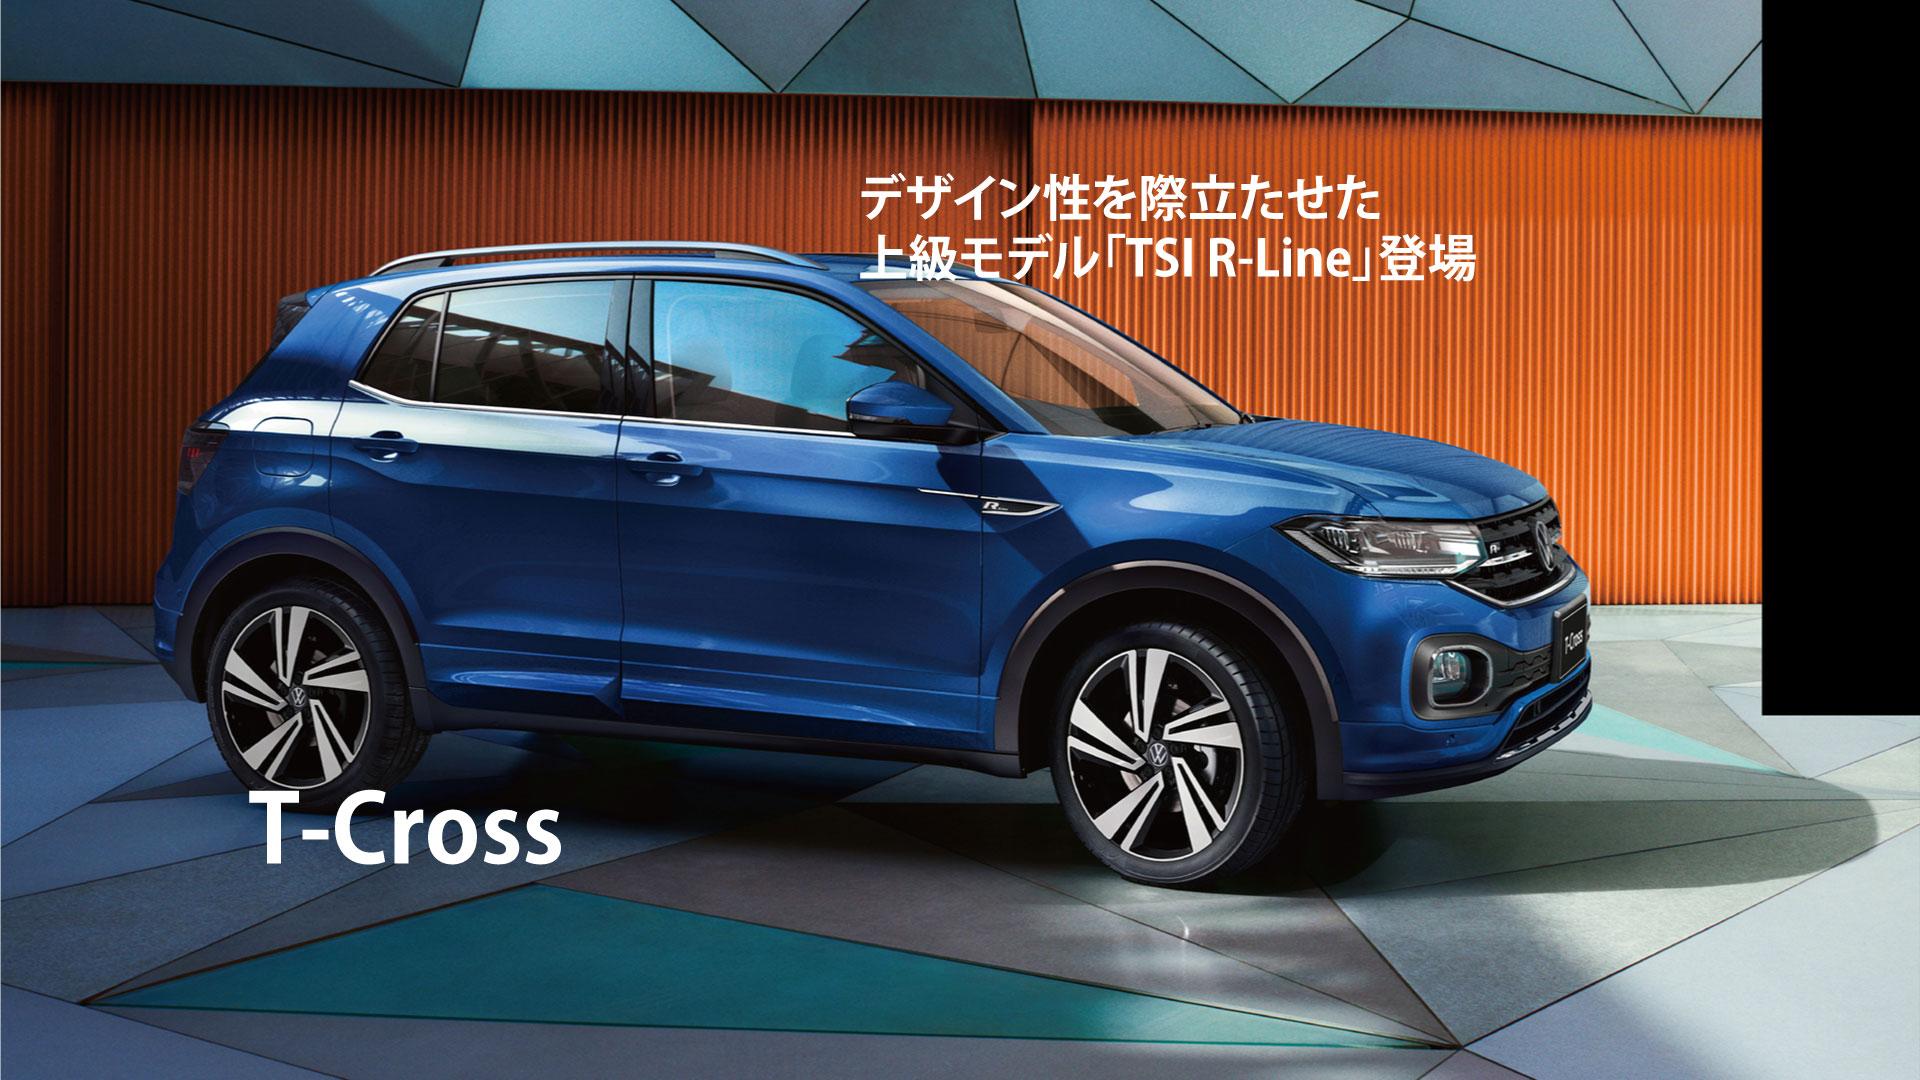 New T-Cross